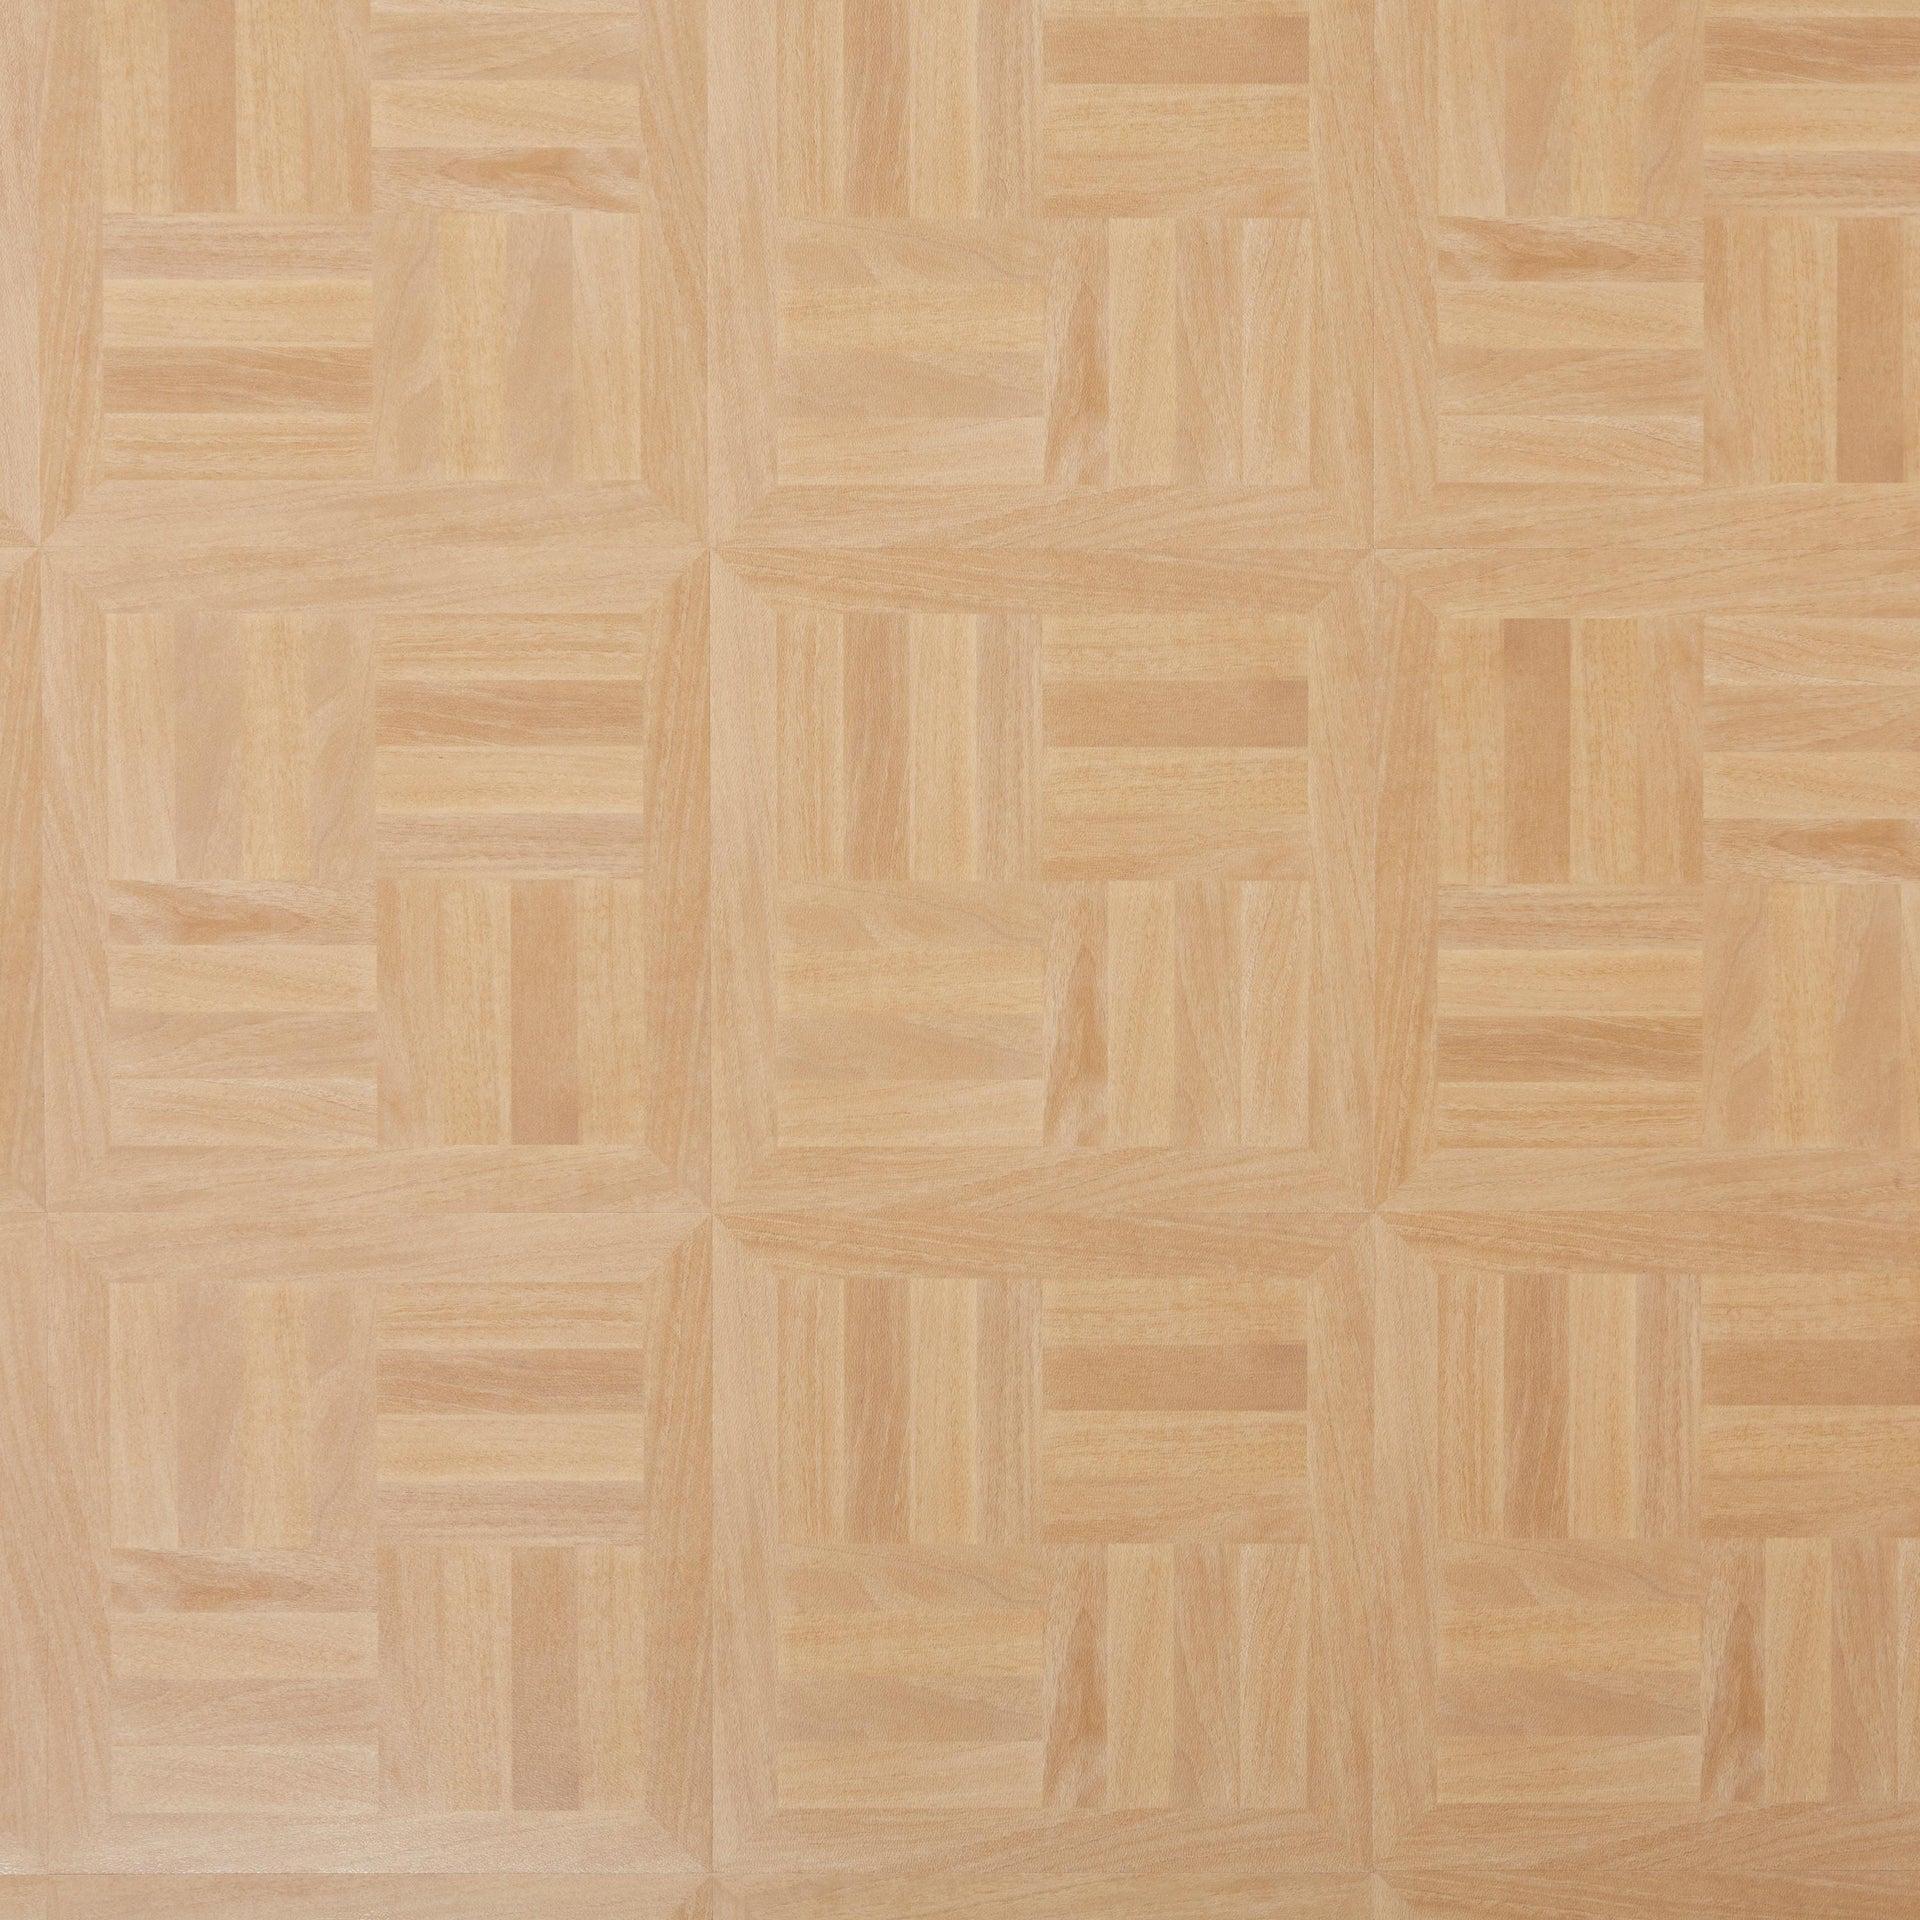 Pavimento PVC adesivo Dugan Sp 1.2 mm giallo / dorato - 8